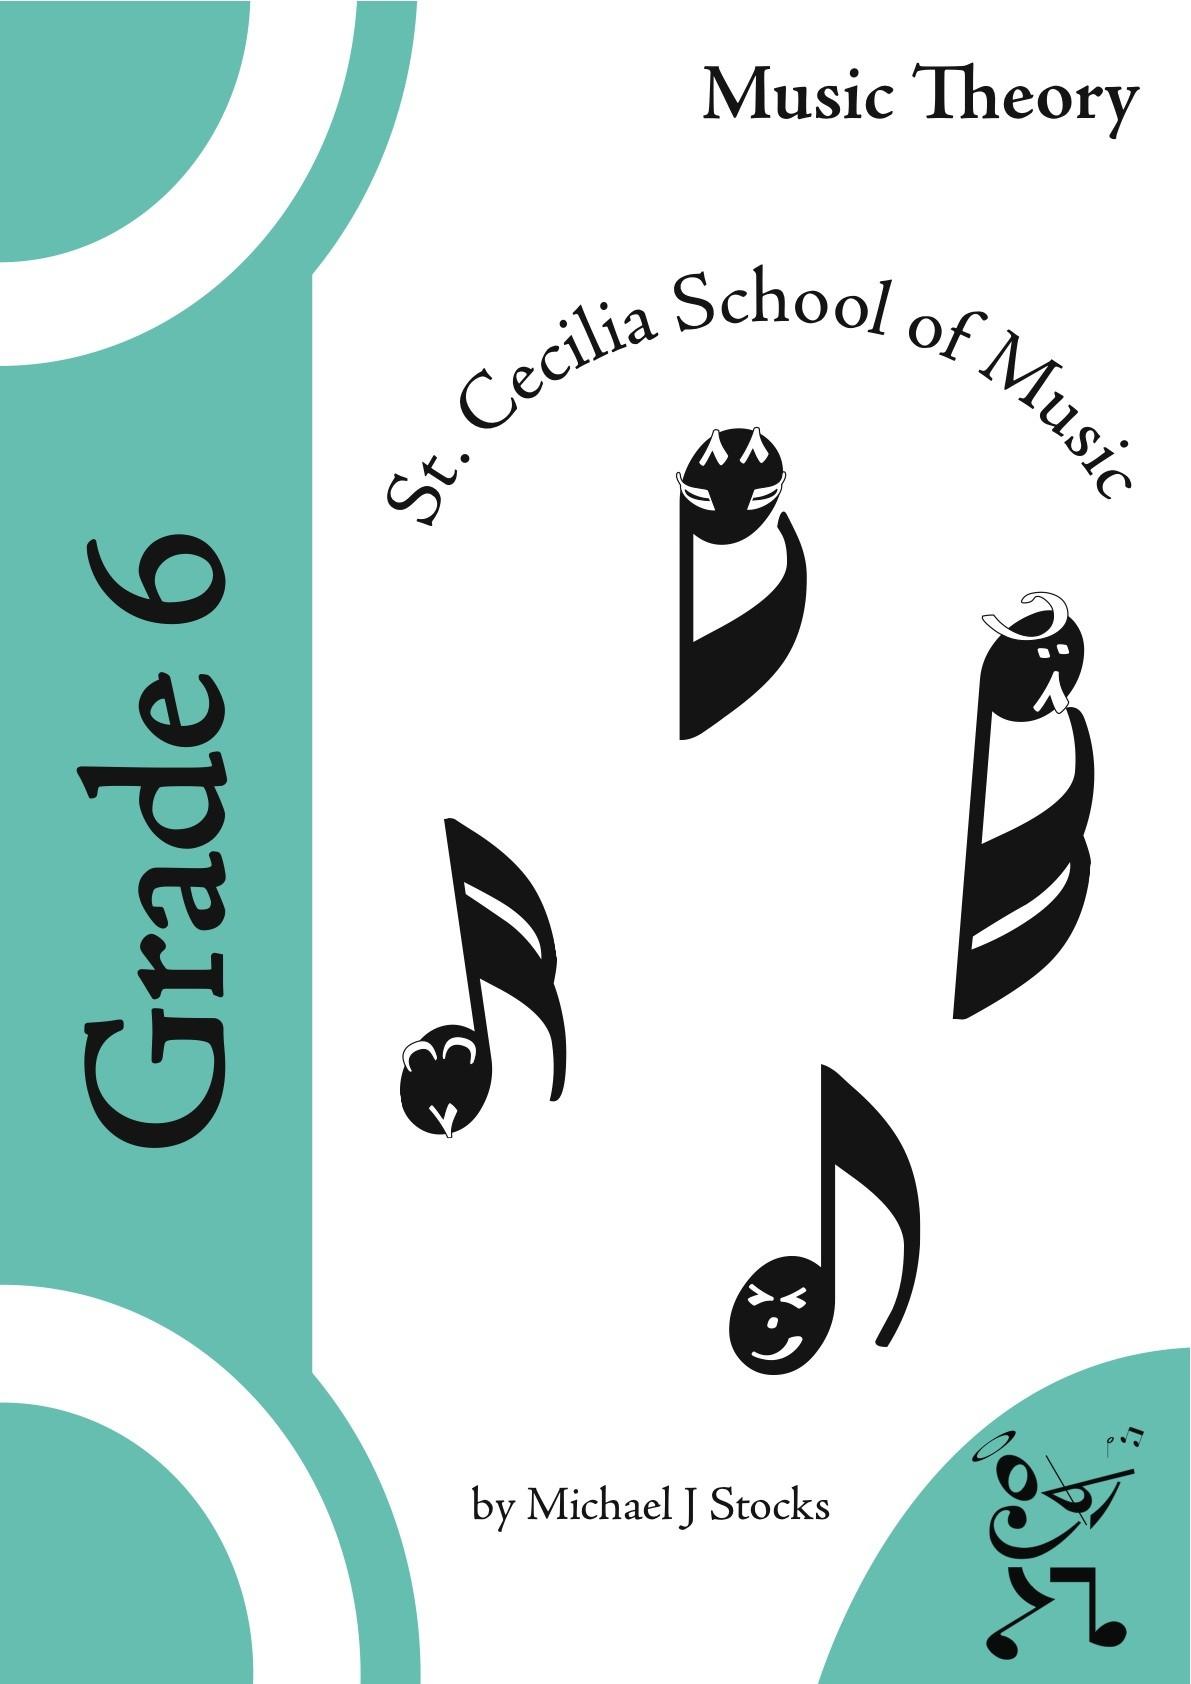 SCSM Music Theory Grade 6